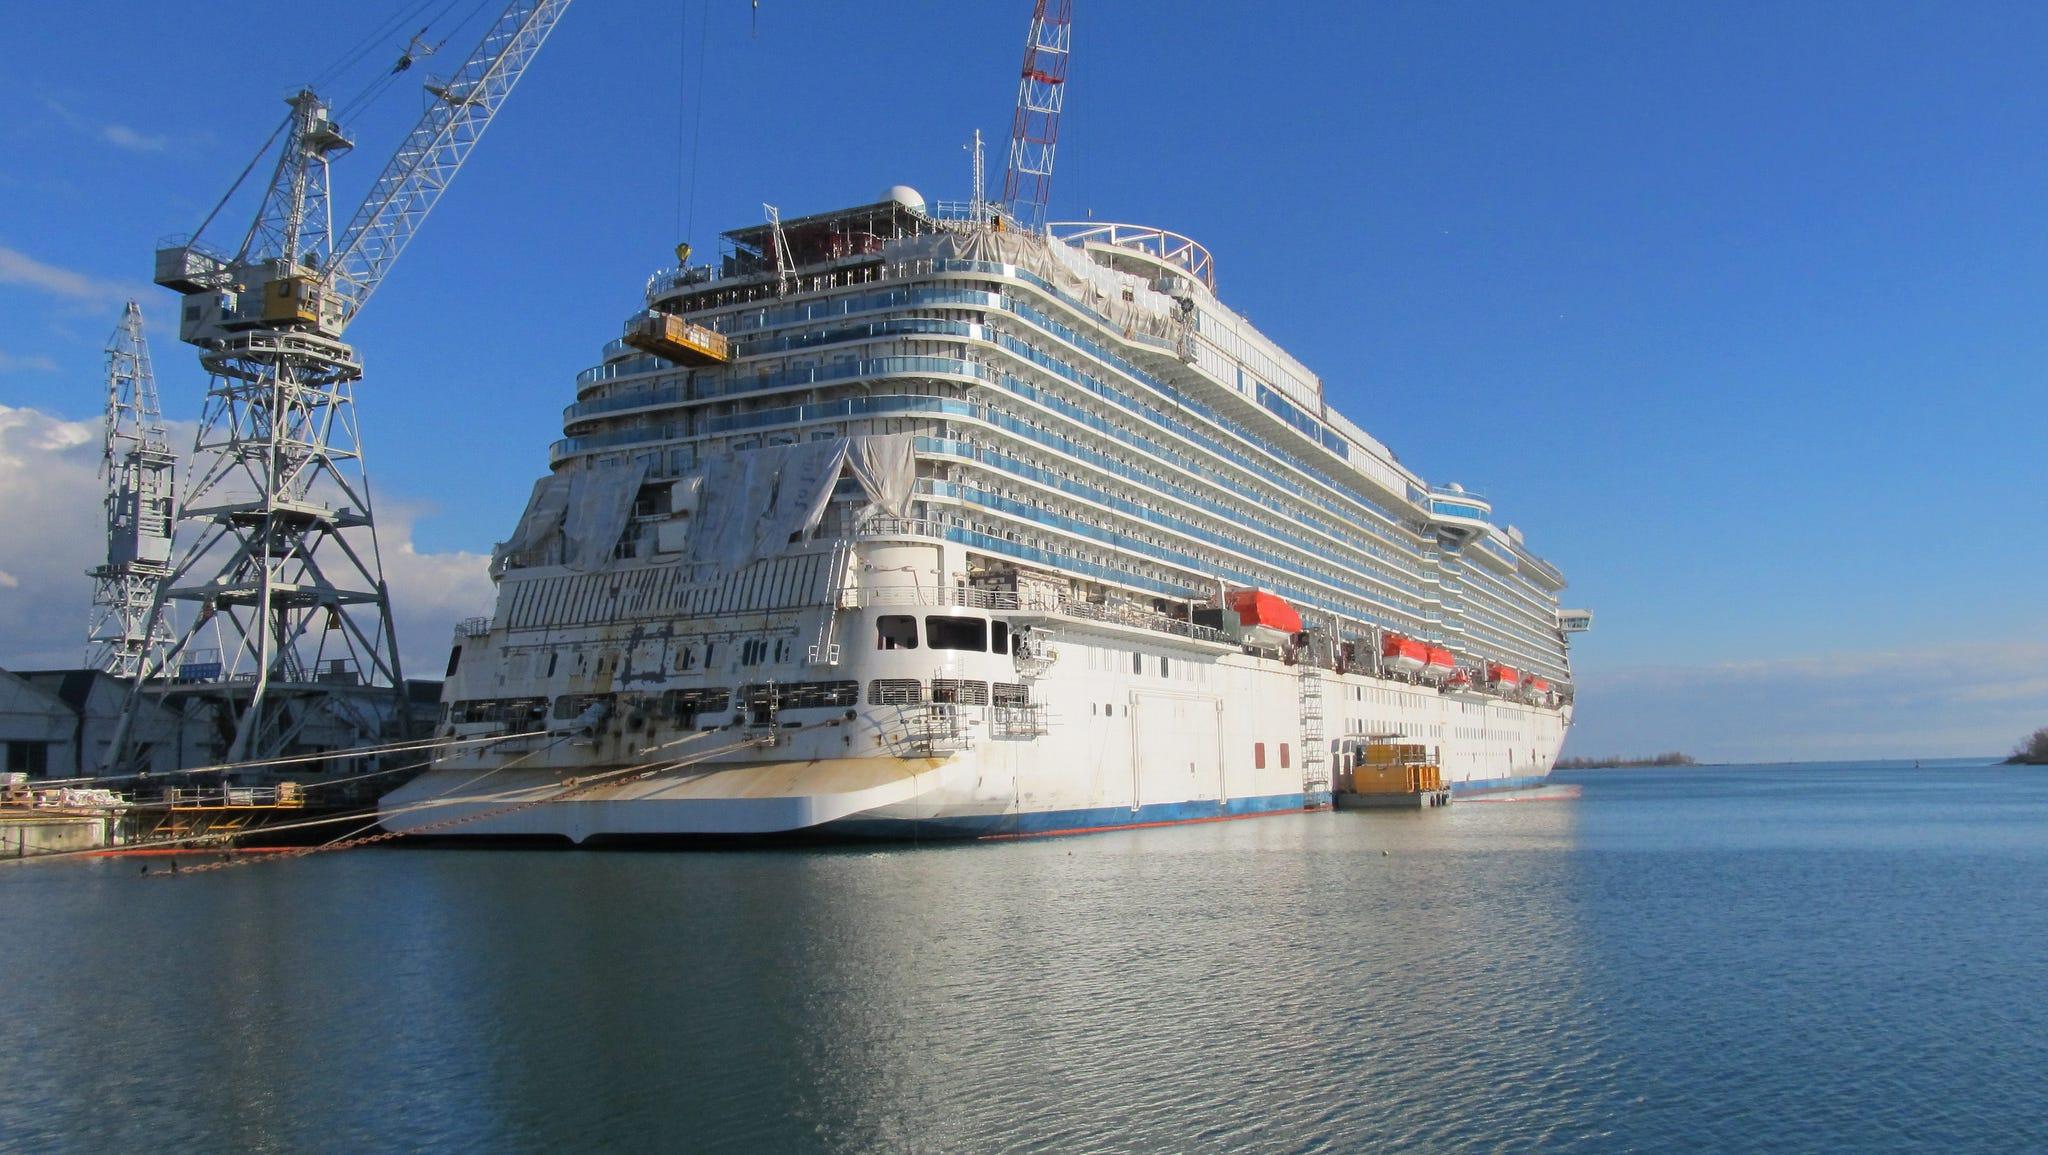 Photo Tour  A Sneak Peek At Princess Cruises U0026 39  Next Ship